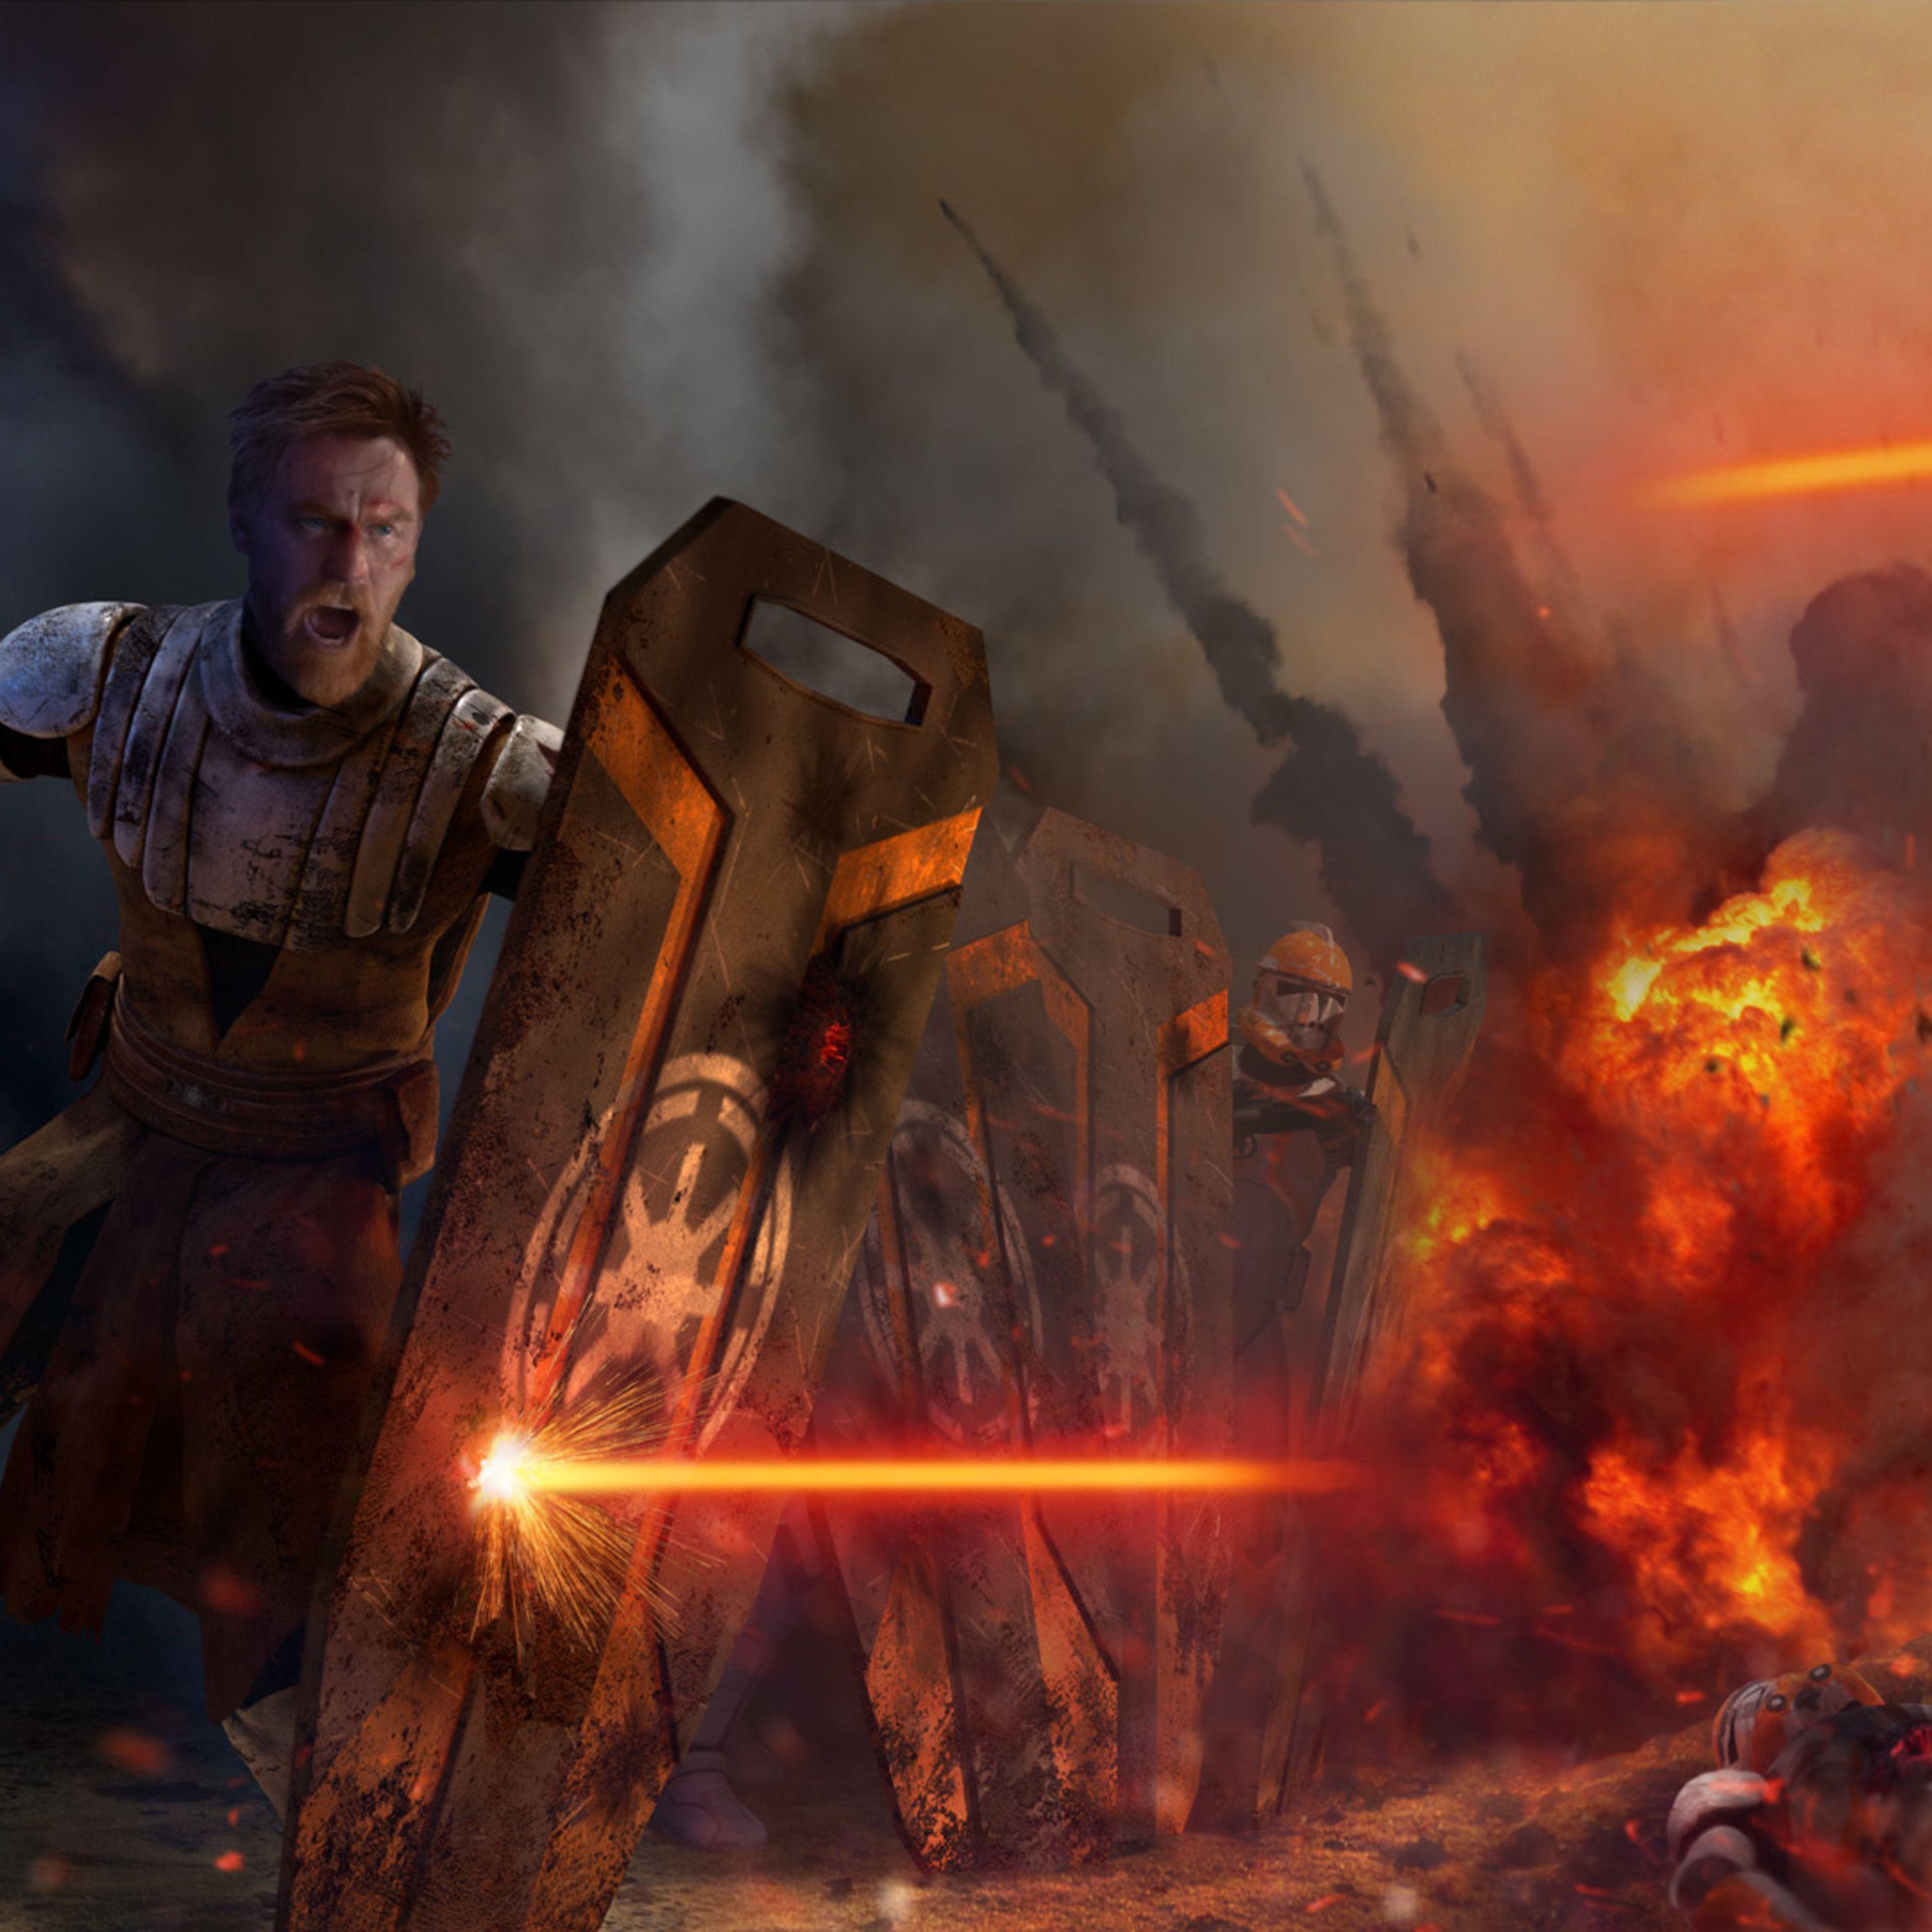 Obi Wan Kenobi Wallpapers Top Free Obi Wan Kenobi Backgrounds